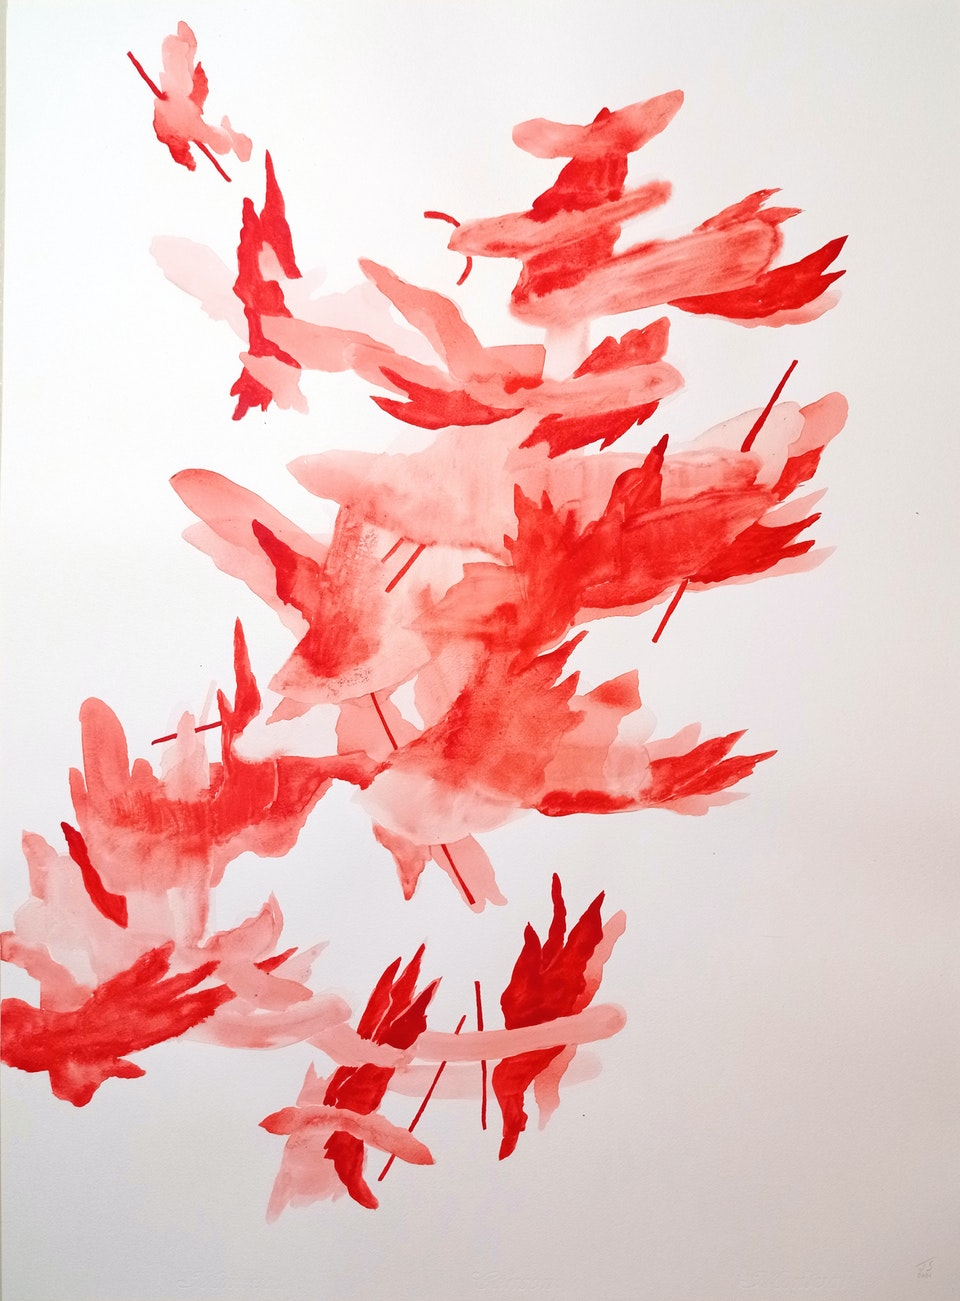 Blaze IV_2021_Justin Southey - Justin Southey 2021 Blaze IV Acrylic ink on paper 75cm x 55cm  ZAR 20 500